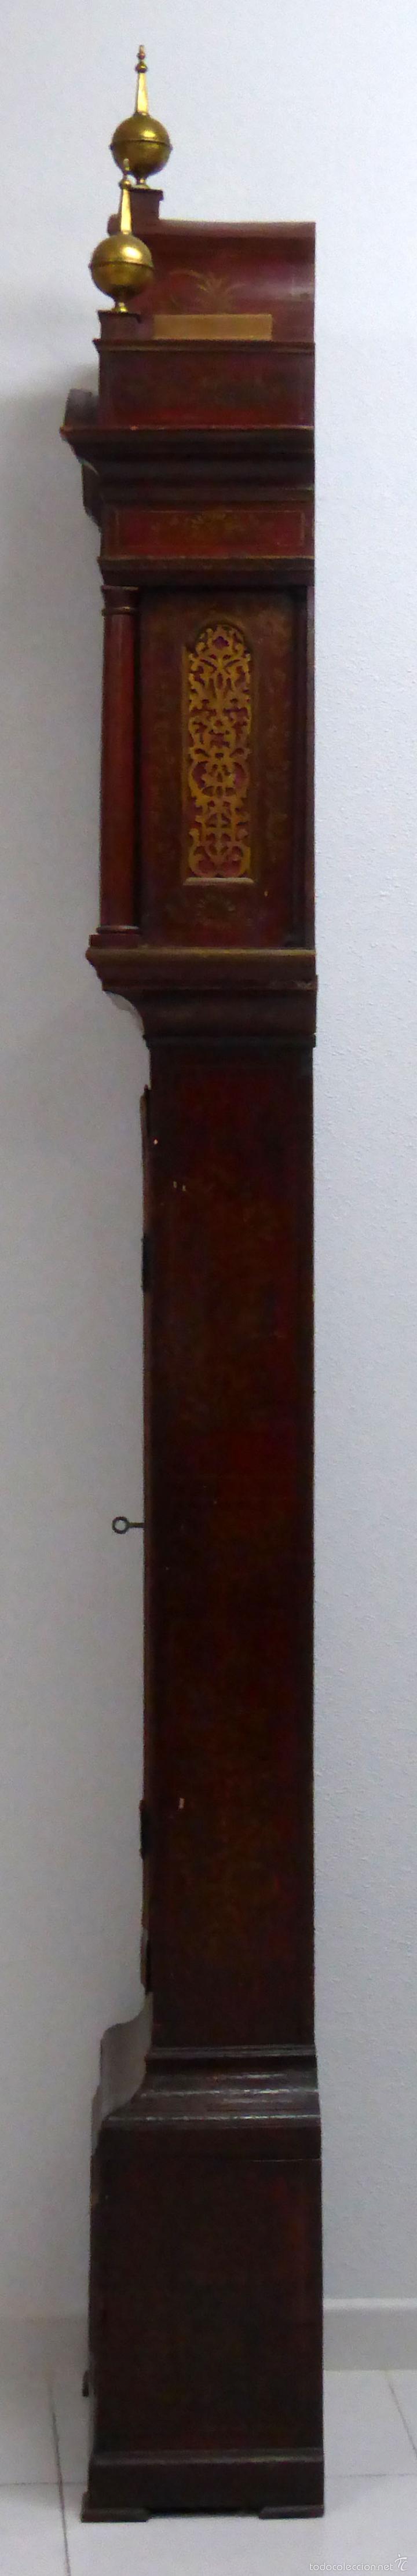 Relojes de pie: Reloj pie inglés laca japanning chinoseries S XVIII Maquinaria William Fidgett London Funciona - Foto 22 - 58294331